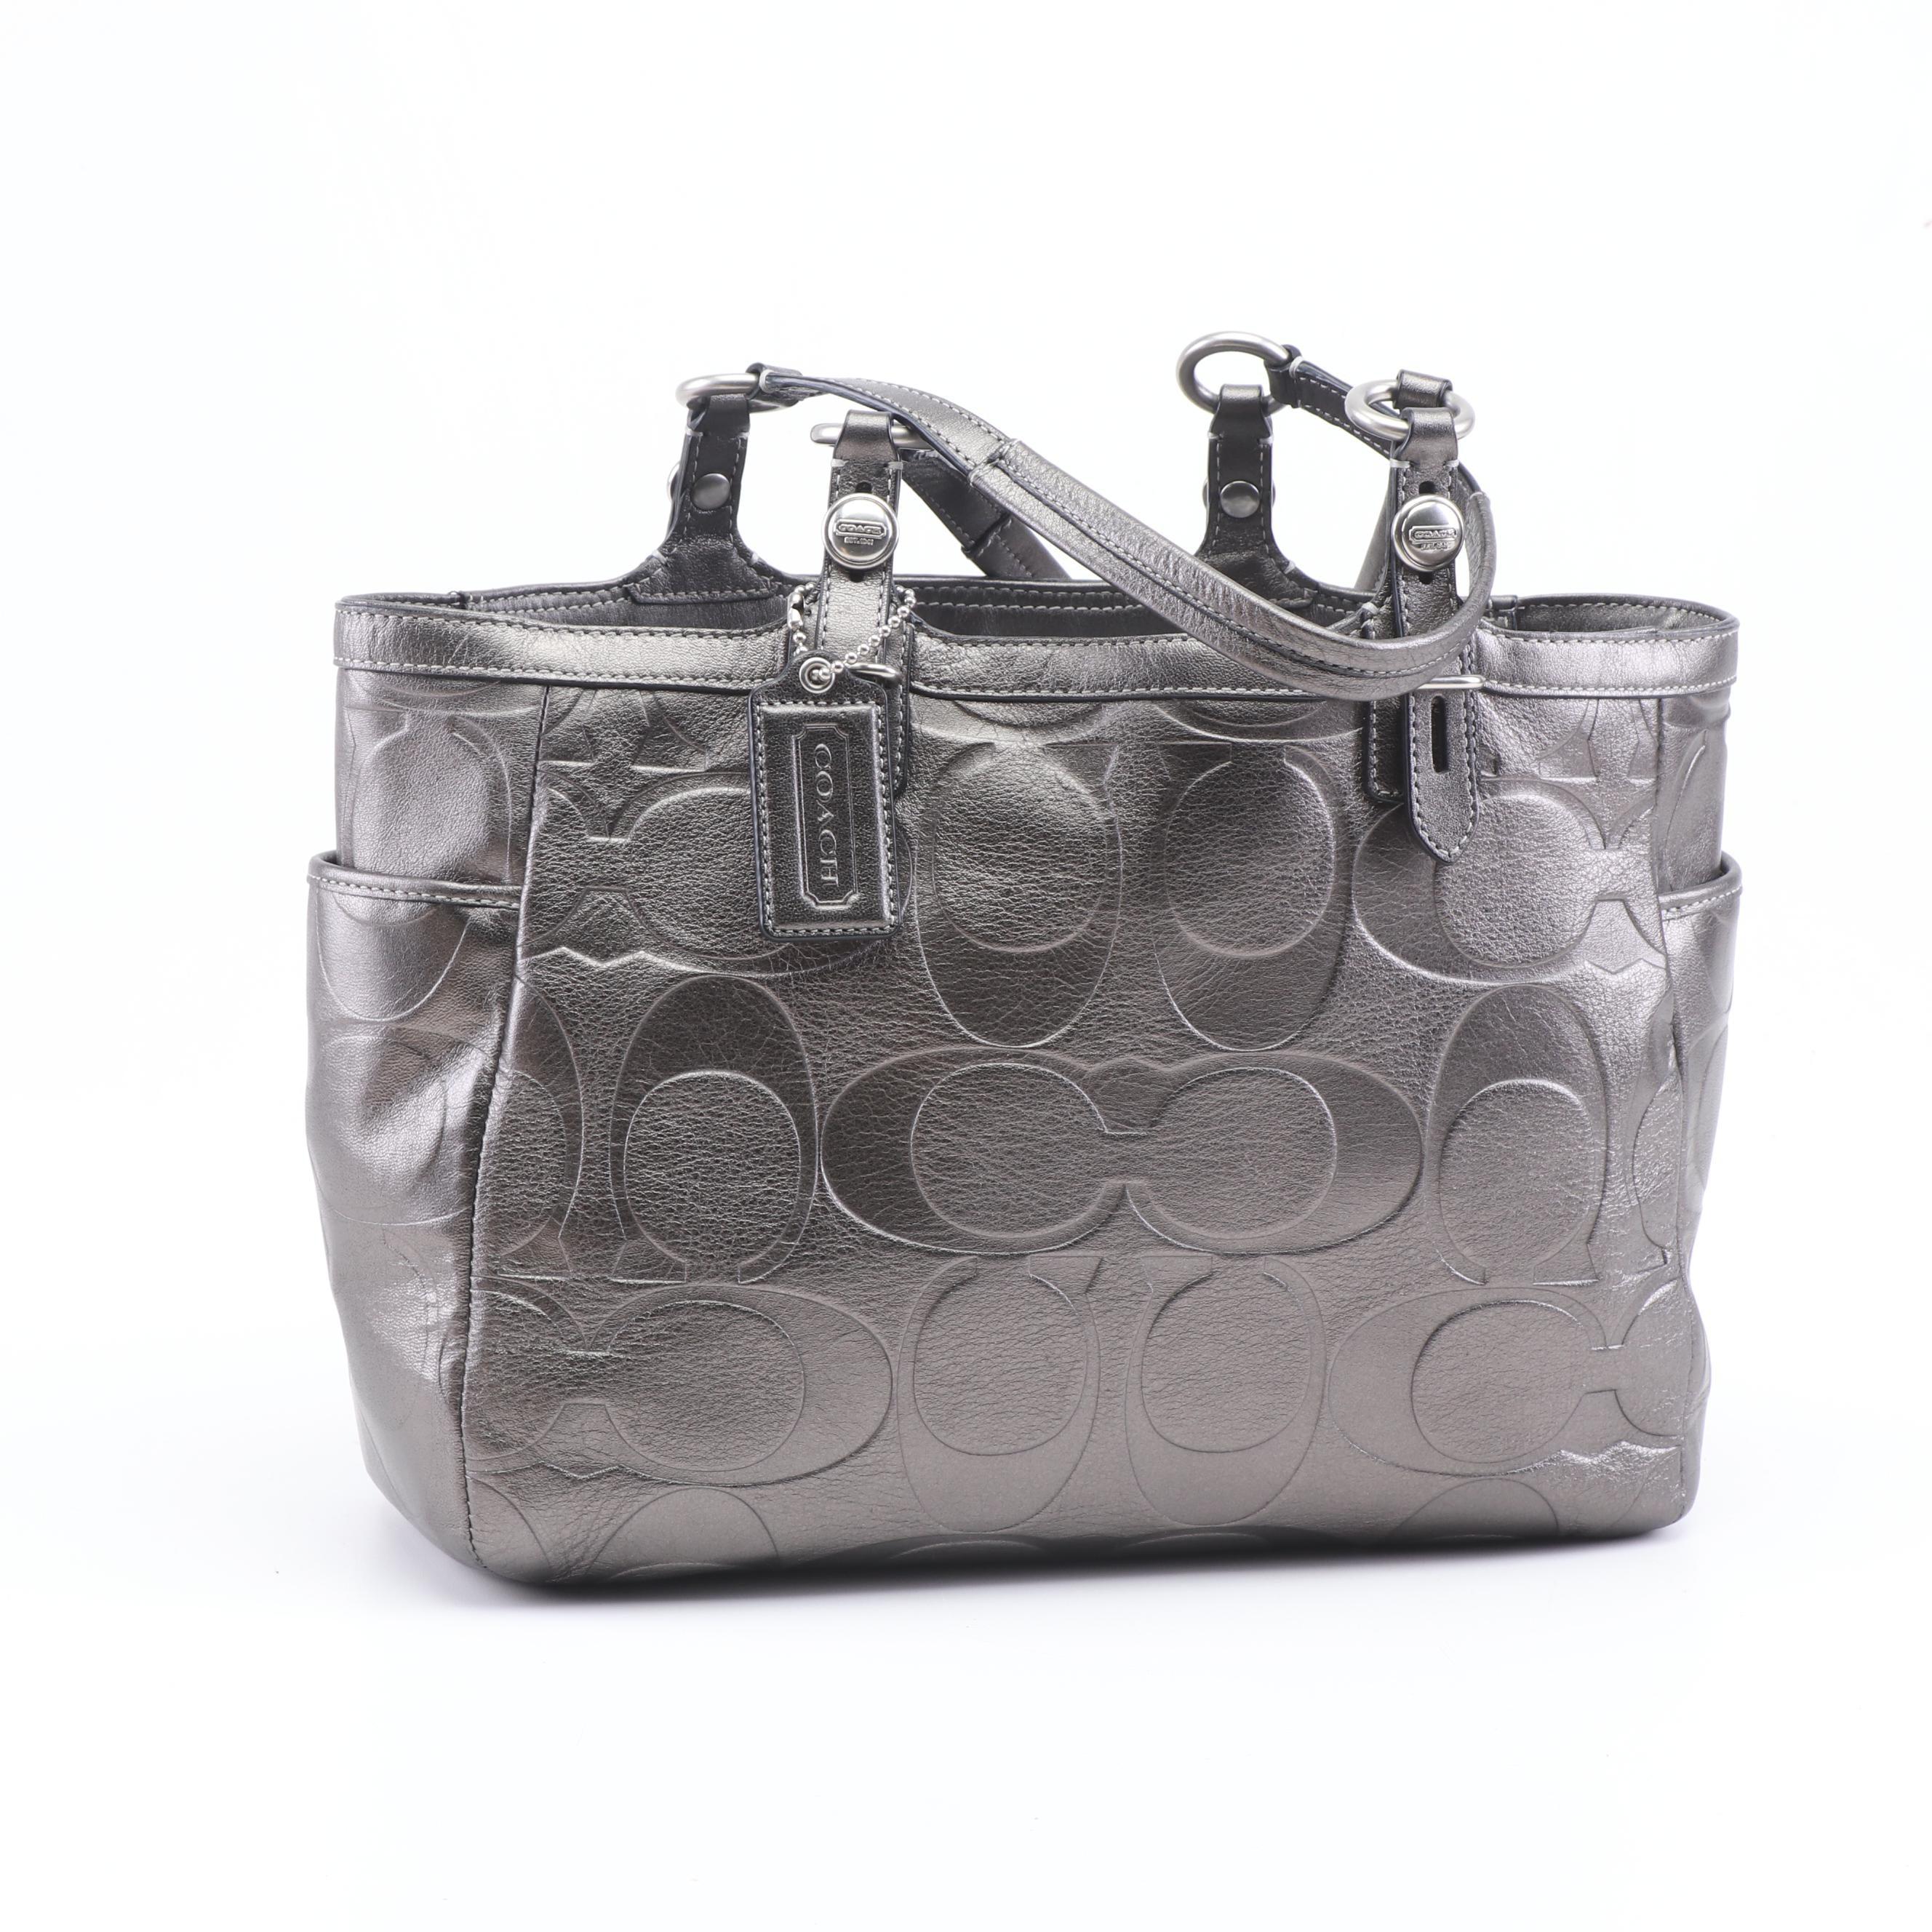 Coach Signature Gunmetal Metallic Leather Tote Bag